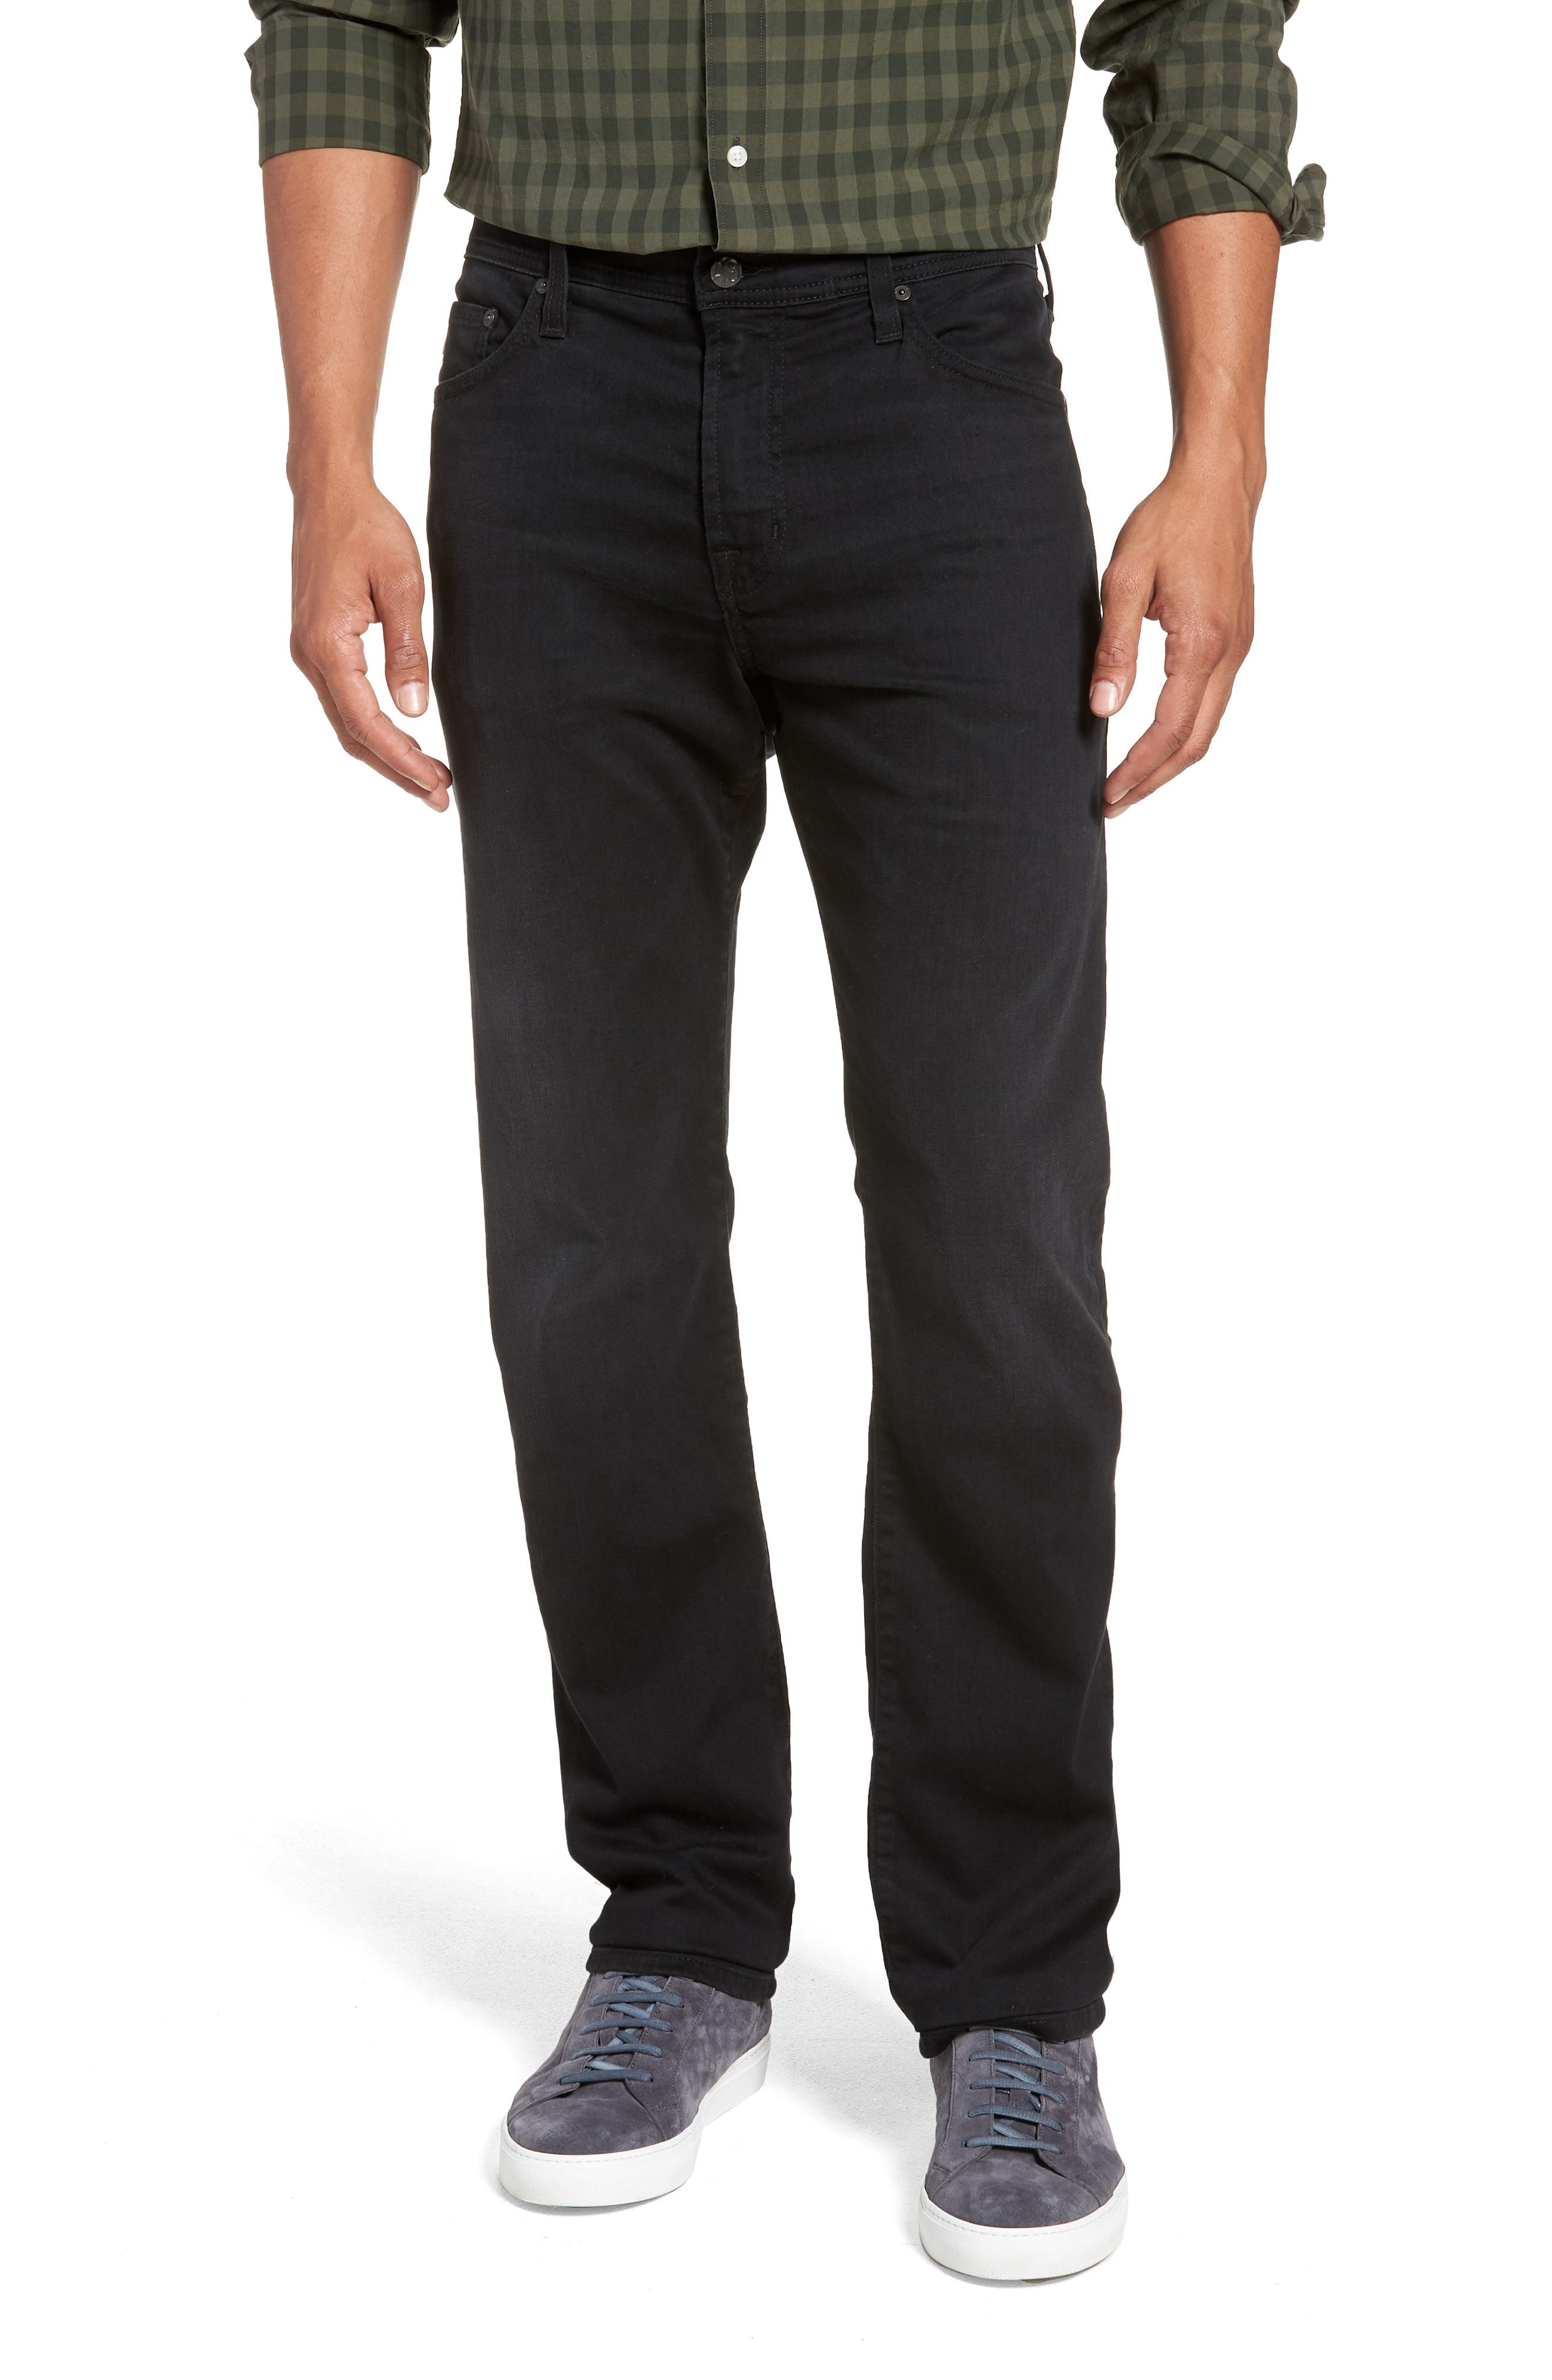 Everett Slim Straight Leg Jeans,                             Main thumbnail 1, color,                             001